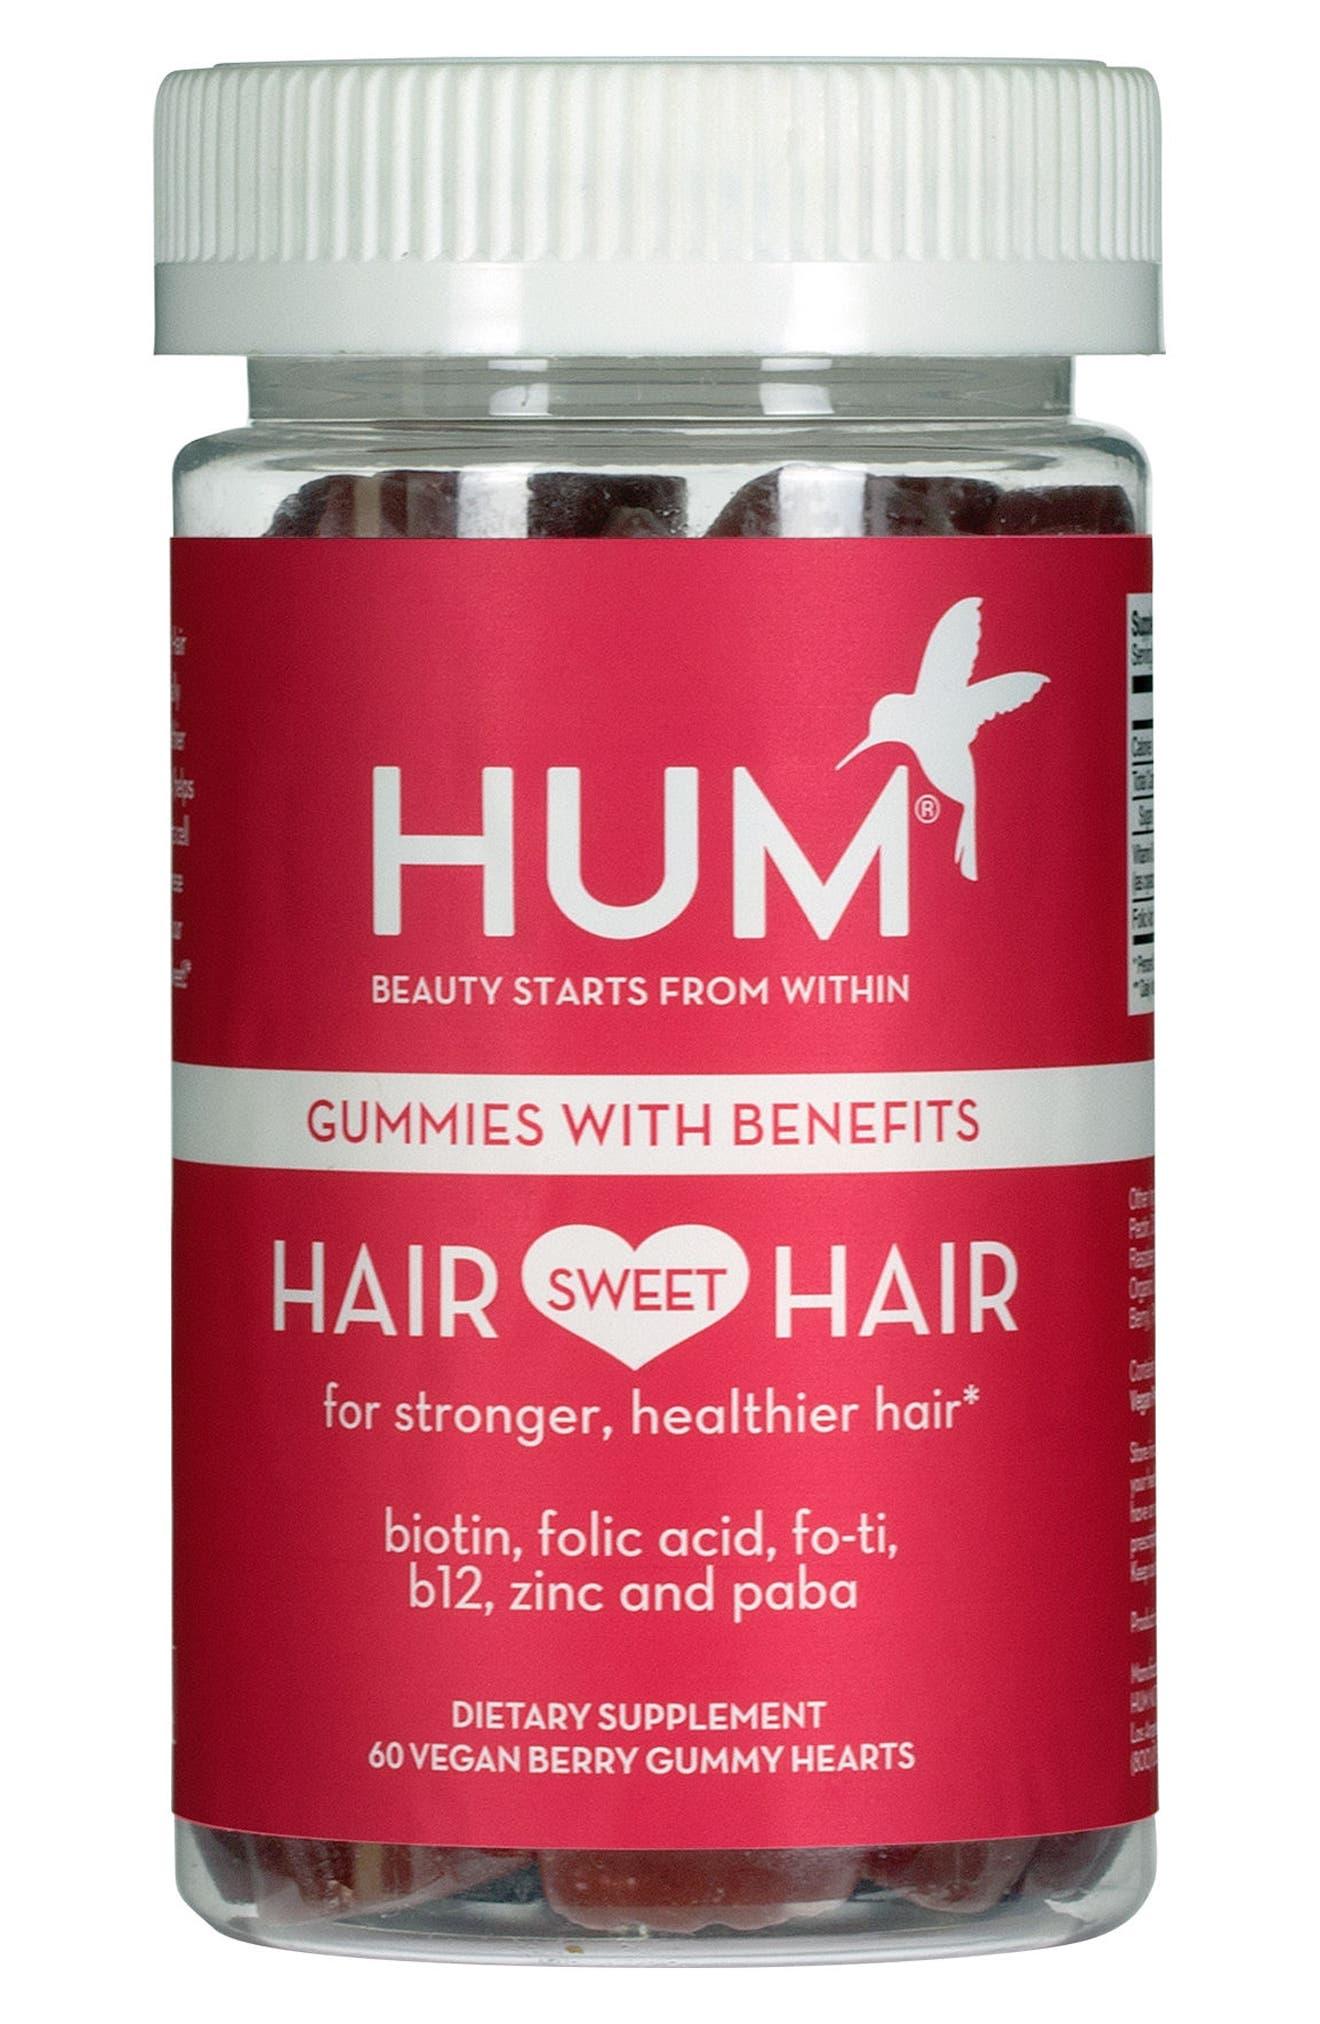 HUM NUTRITION Hair Sweet Hair Gummies Supplement for Healthy Hair, Main, color, NO COLOR